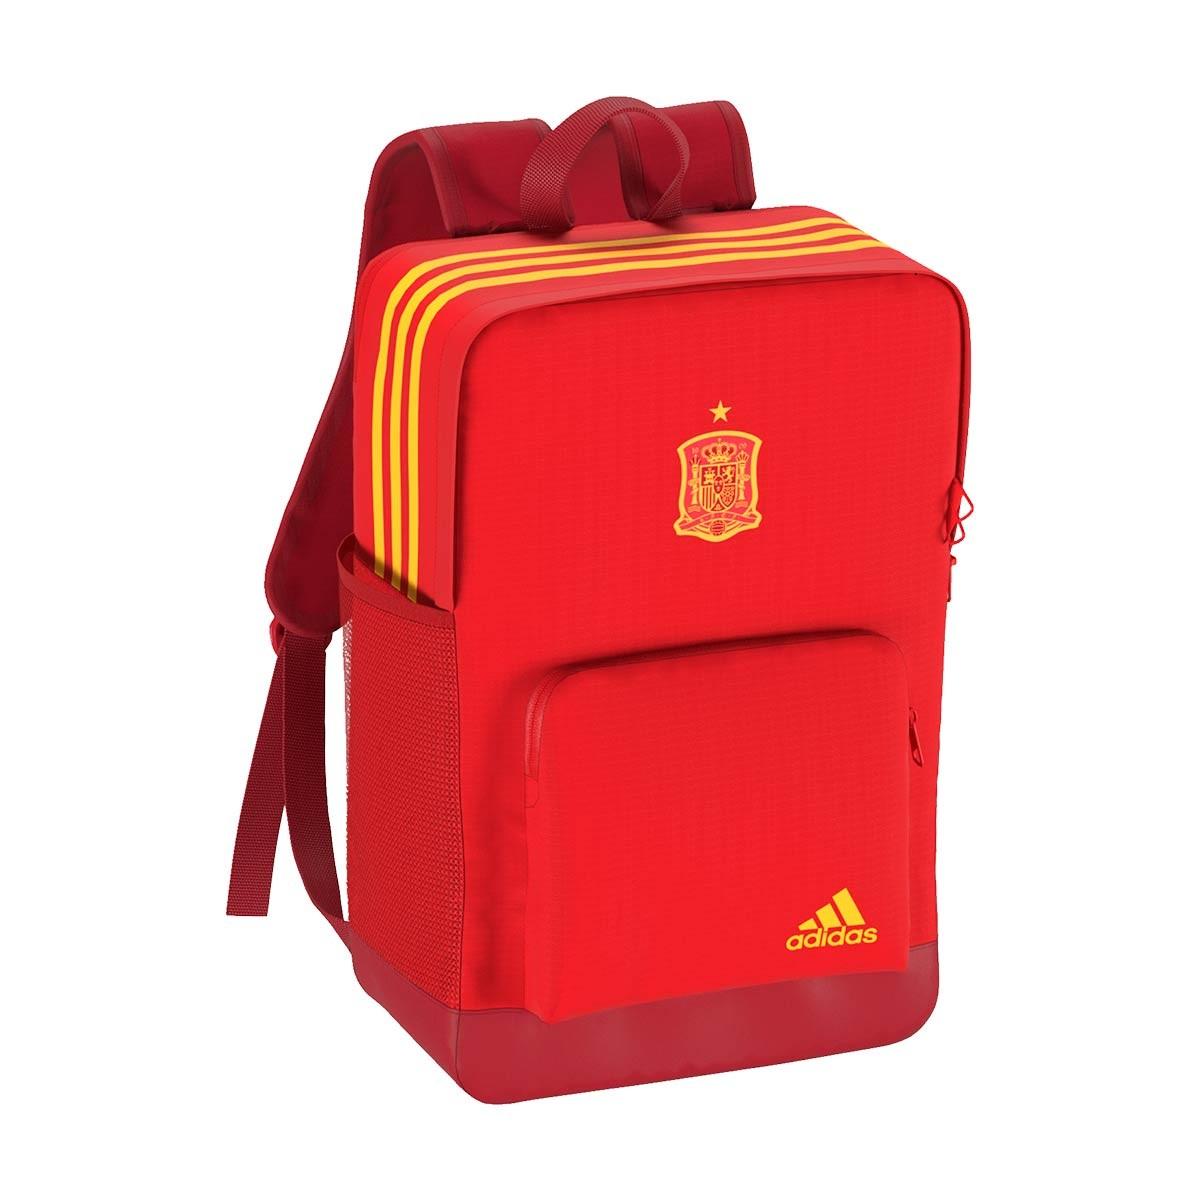 2228e397d2 Backpack adidas Spain 2017-2018 Power red-Gold - Tienda de fútbol ...